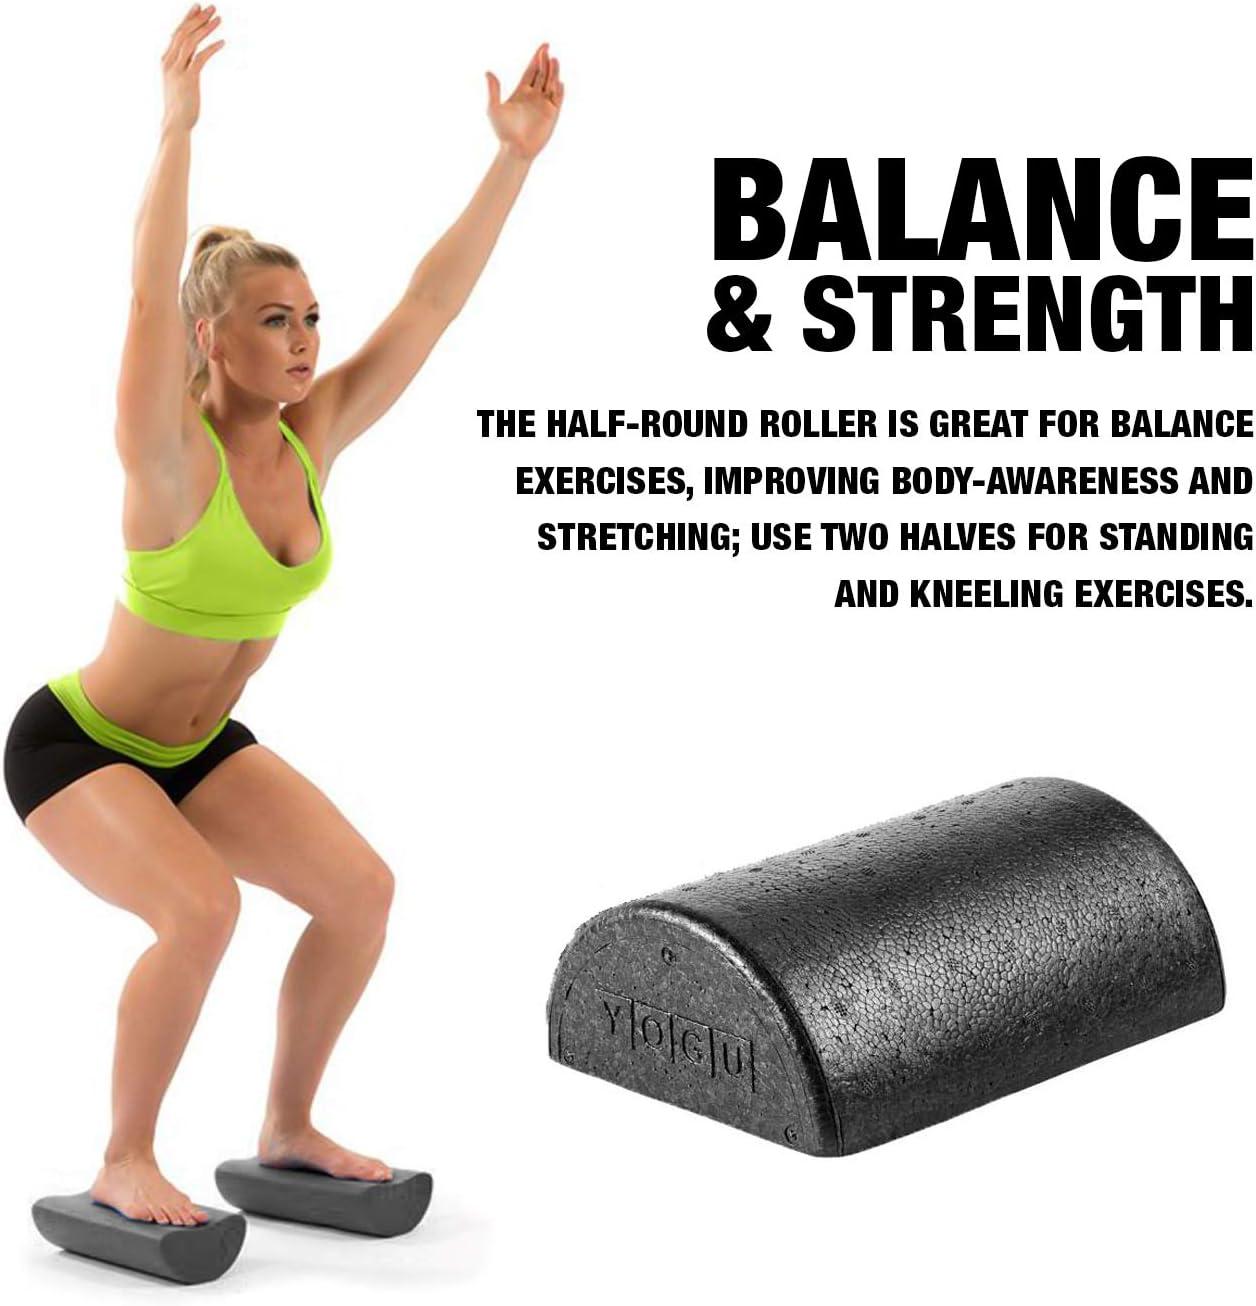 Yoga Foam Roller High Density Half Round Home Gym Exercise Fitness Equipment